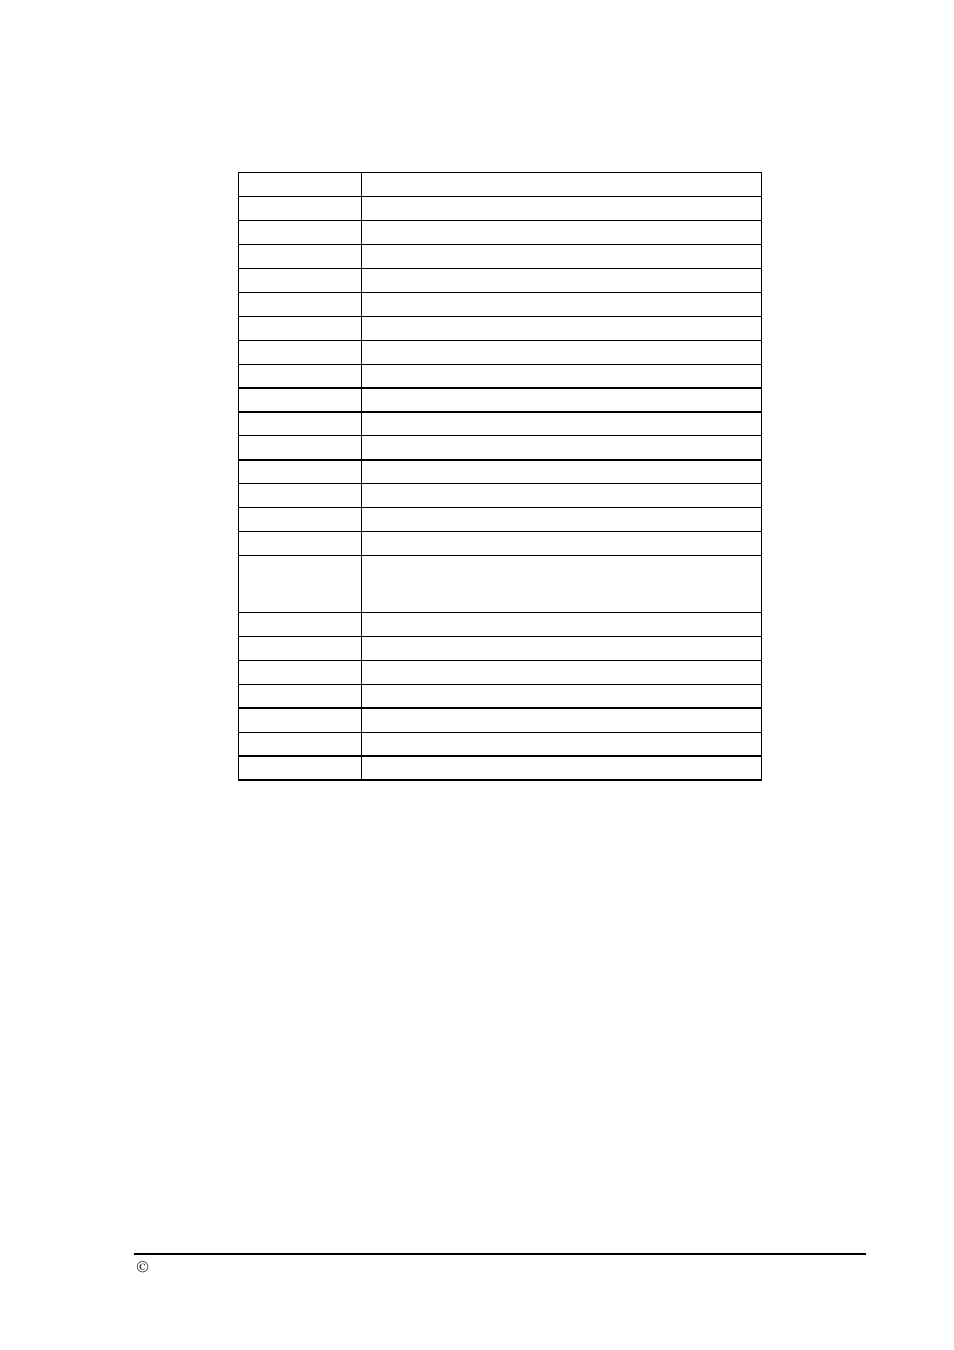 components list power supply philips target board lpc2138 user rh manualsdir com Philips DVD Player Manual Philips TV Manual